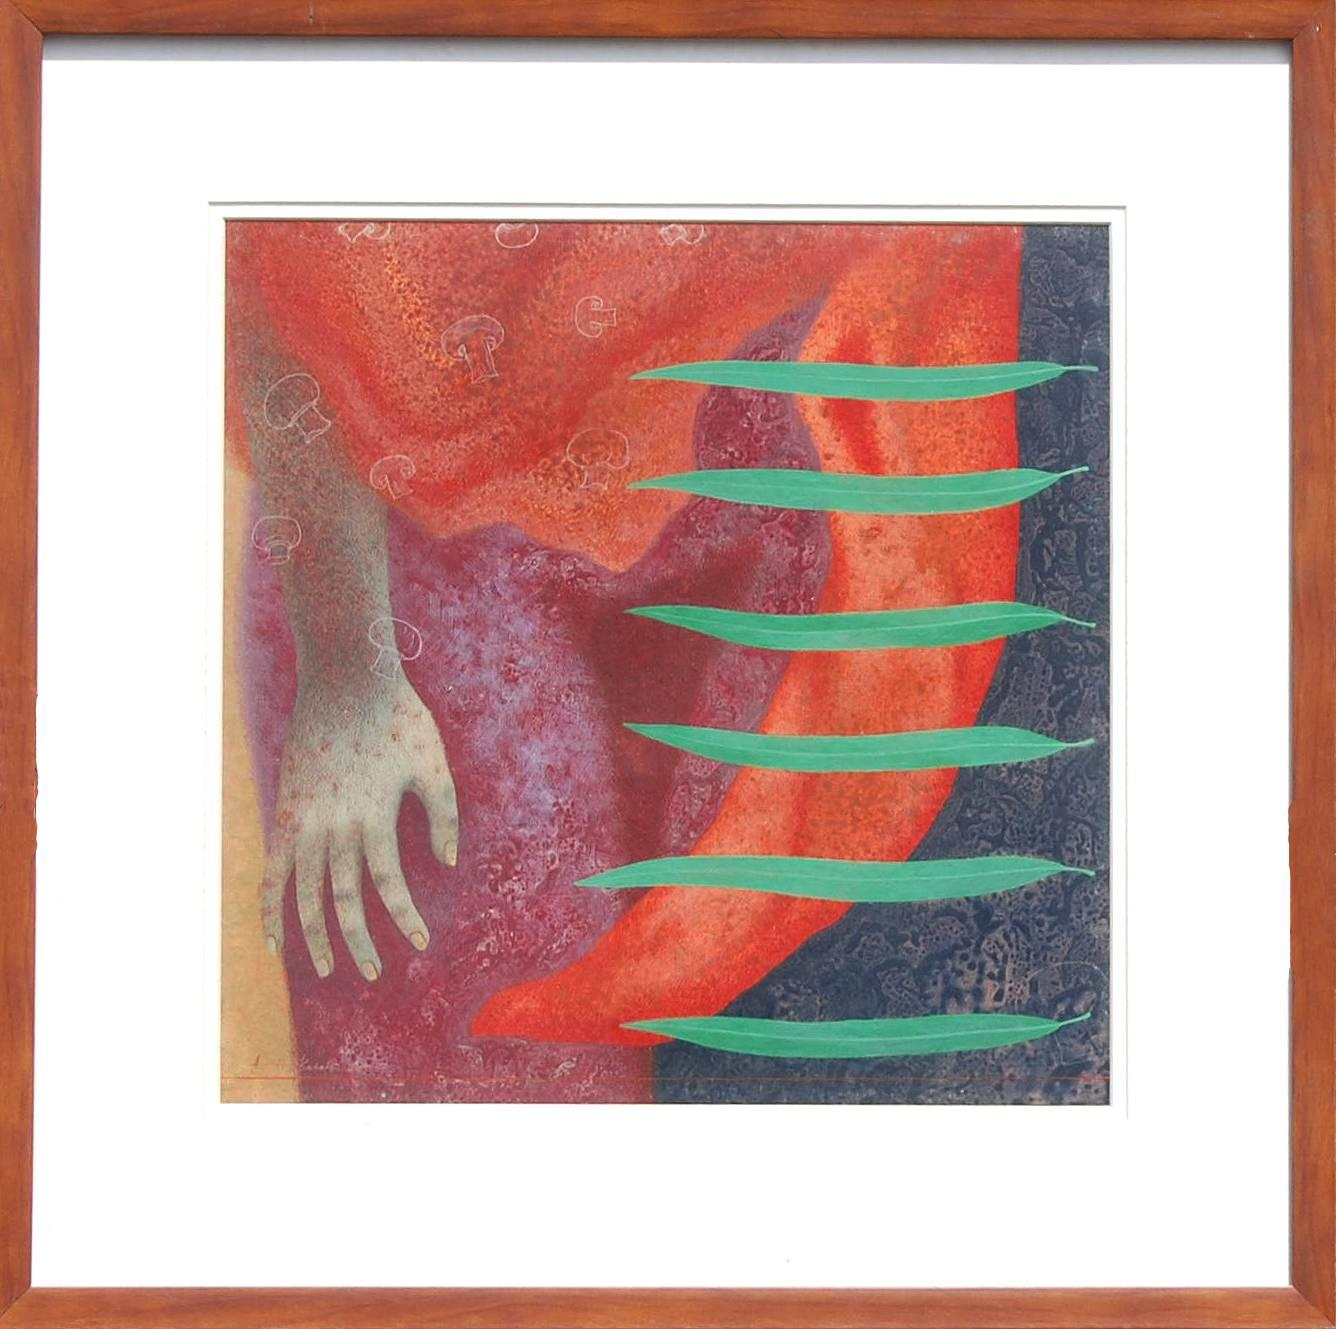 "Figurative, Hand, Tempera on Board, Red, Orange, Green, Indian Artist ""In Stock"""